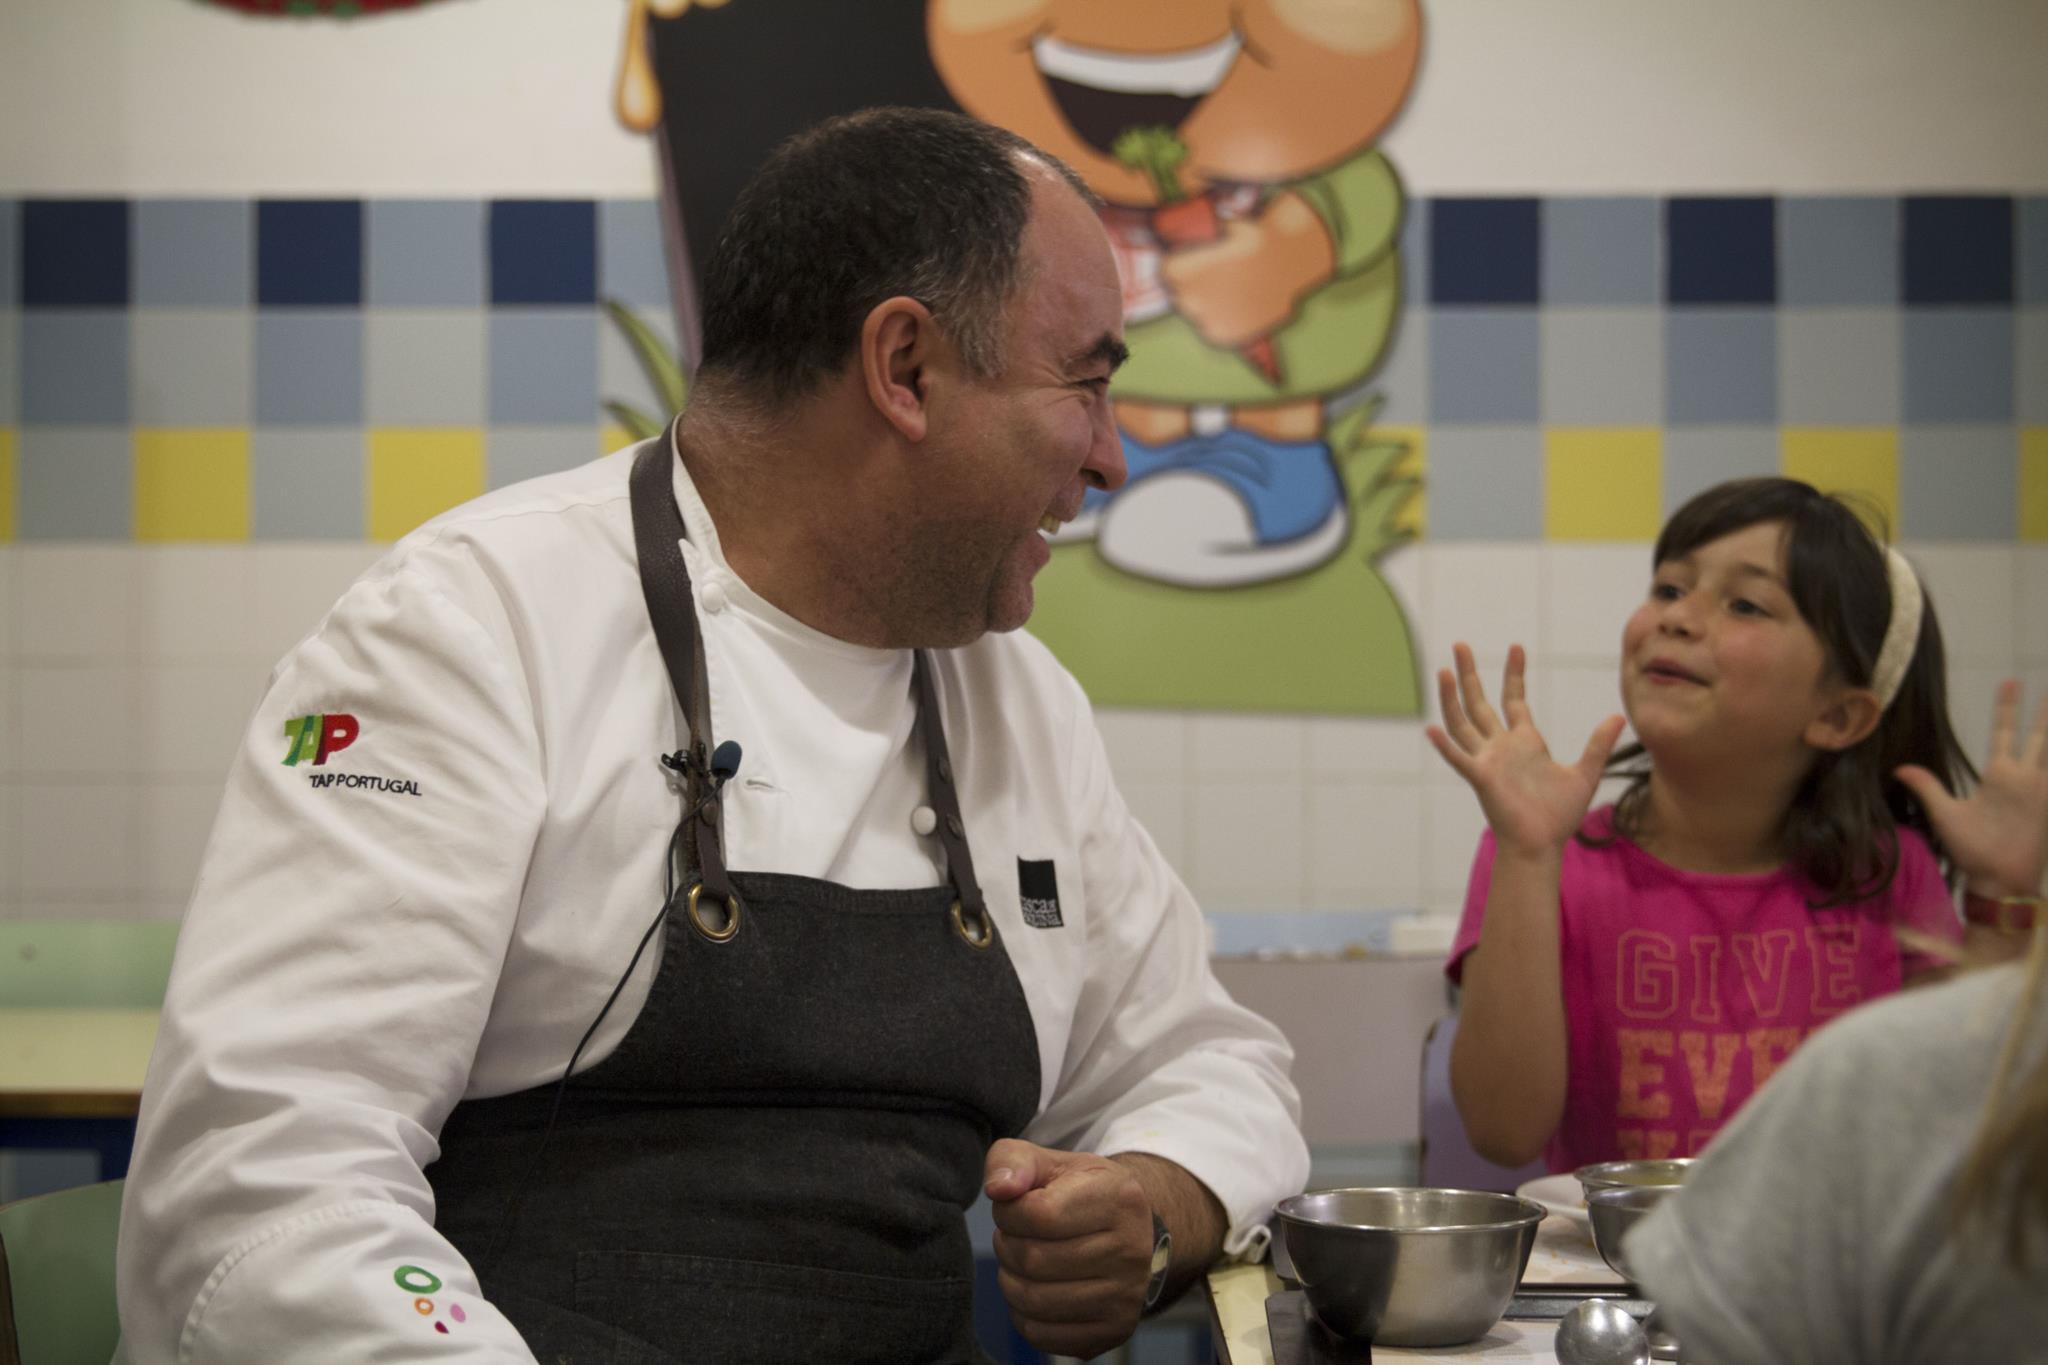 O chef Vítor Sobral preparou o almoço para 350 crianças